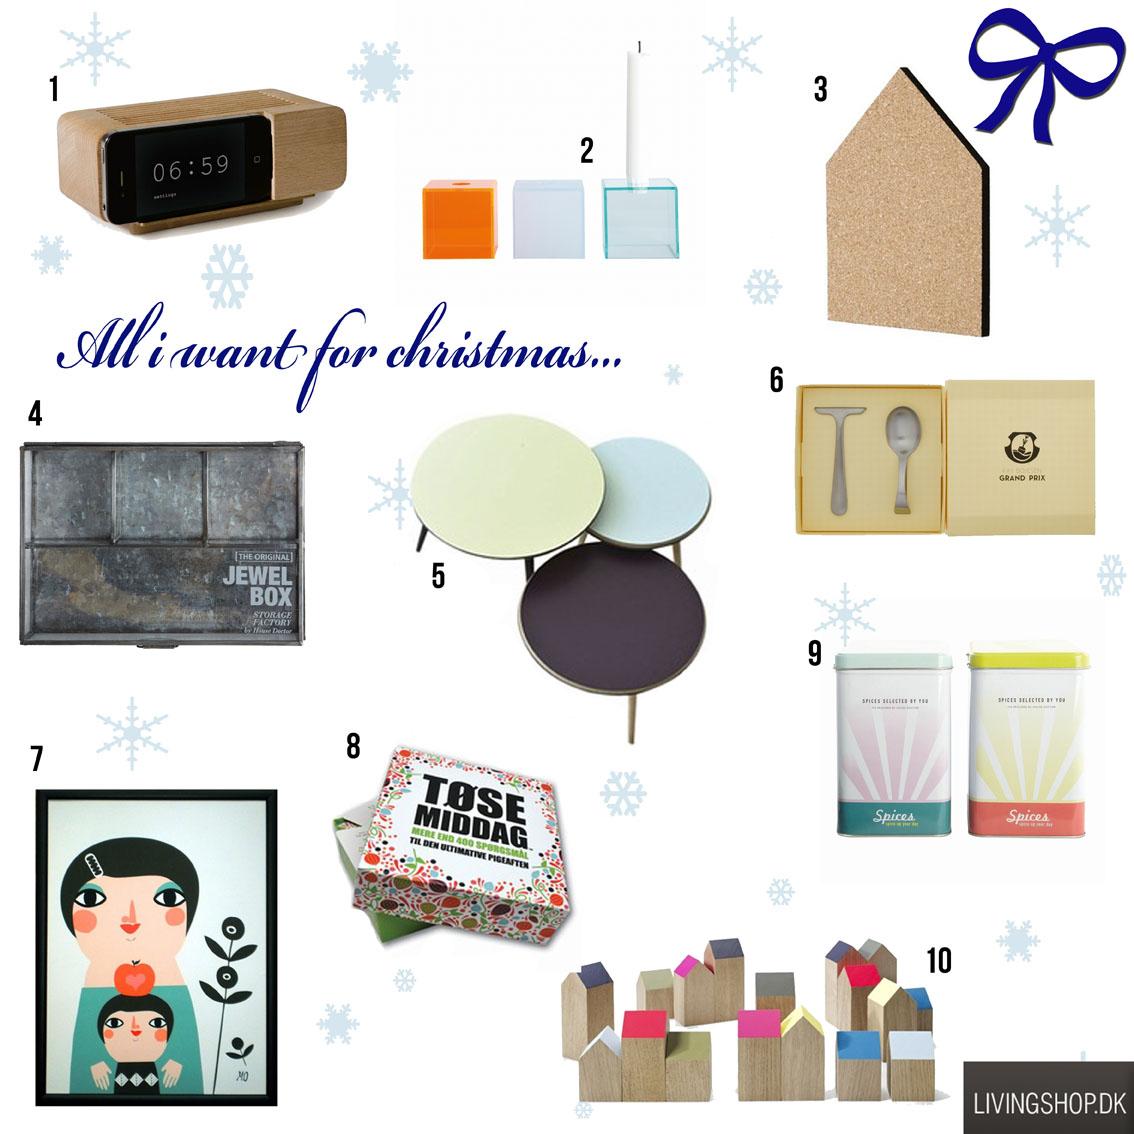 livingshop-julegaver-julegaveideer-oensker-interior-indretning